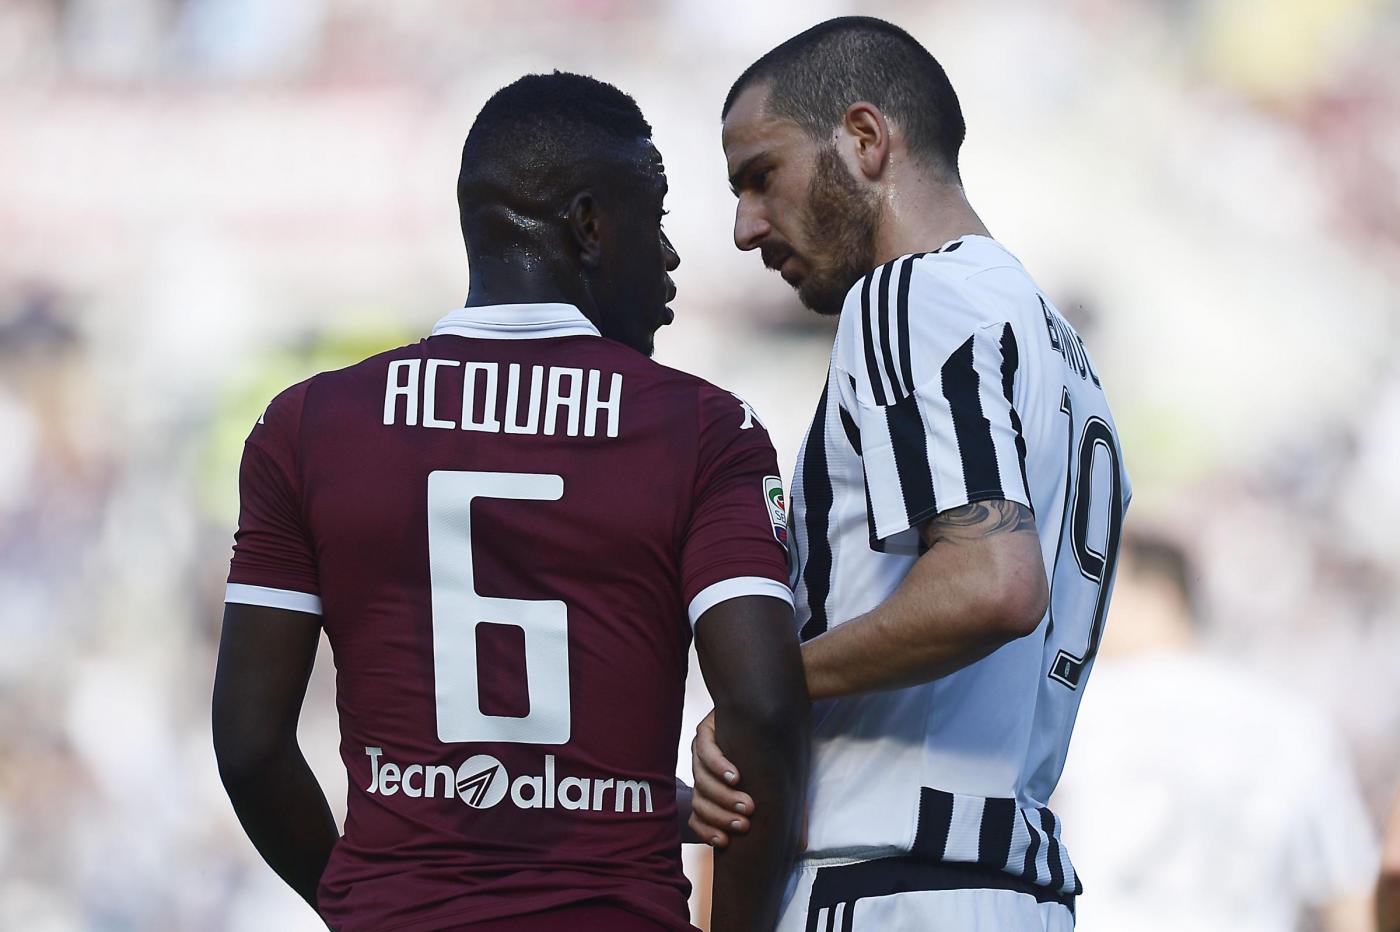 Errori Rizzoli: è bufera su Torino-Juventus